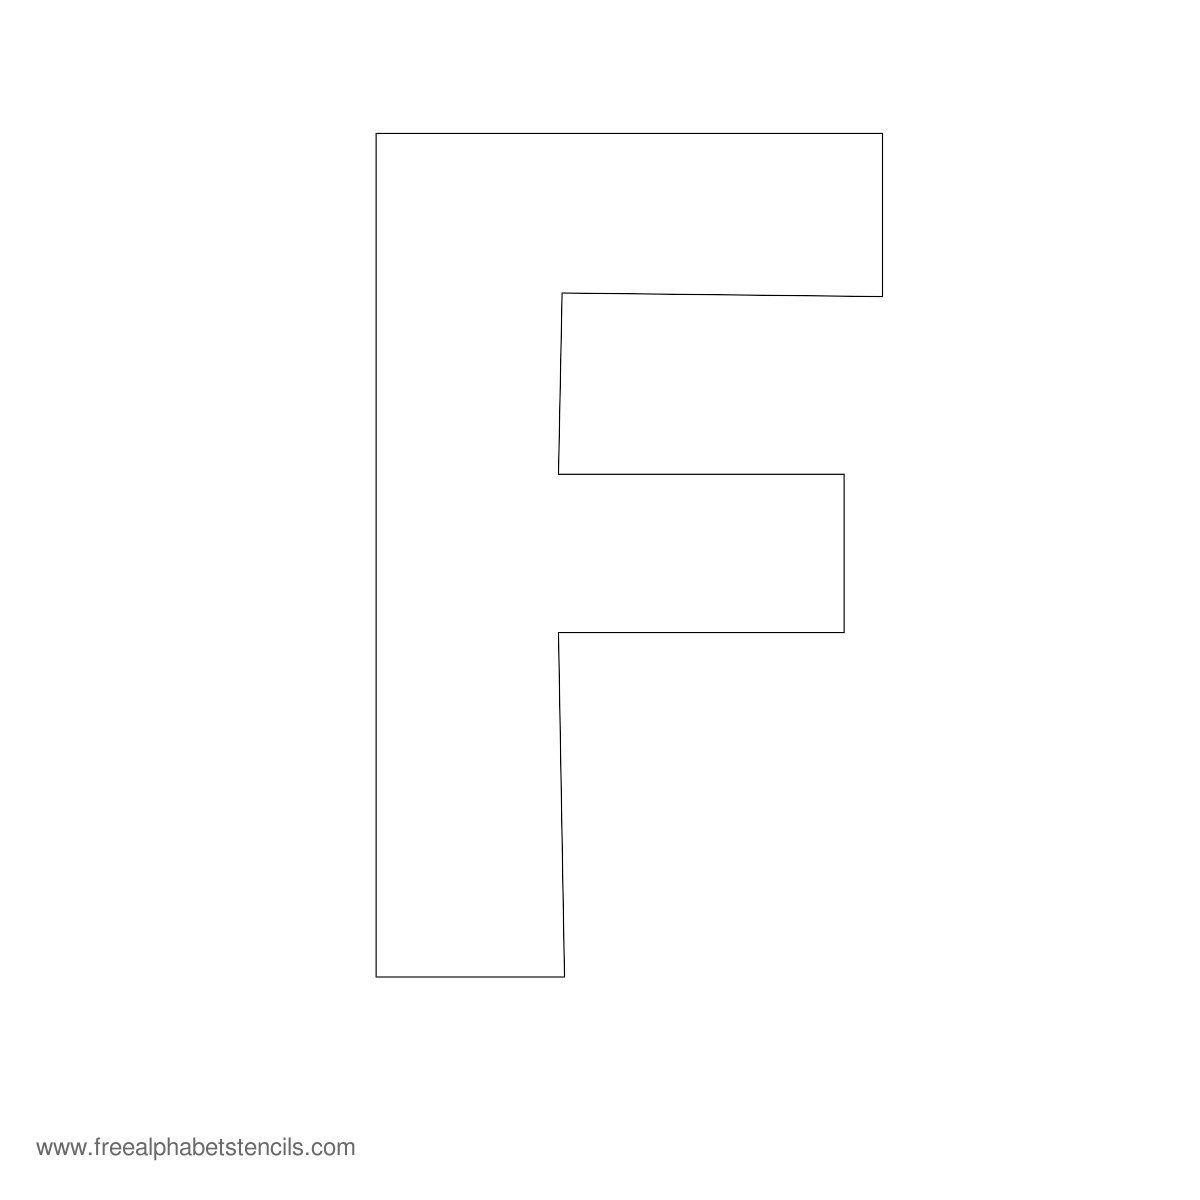 large alphabet stencil f tag sale pinterest With large letter stencils for sale